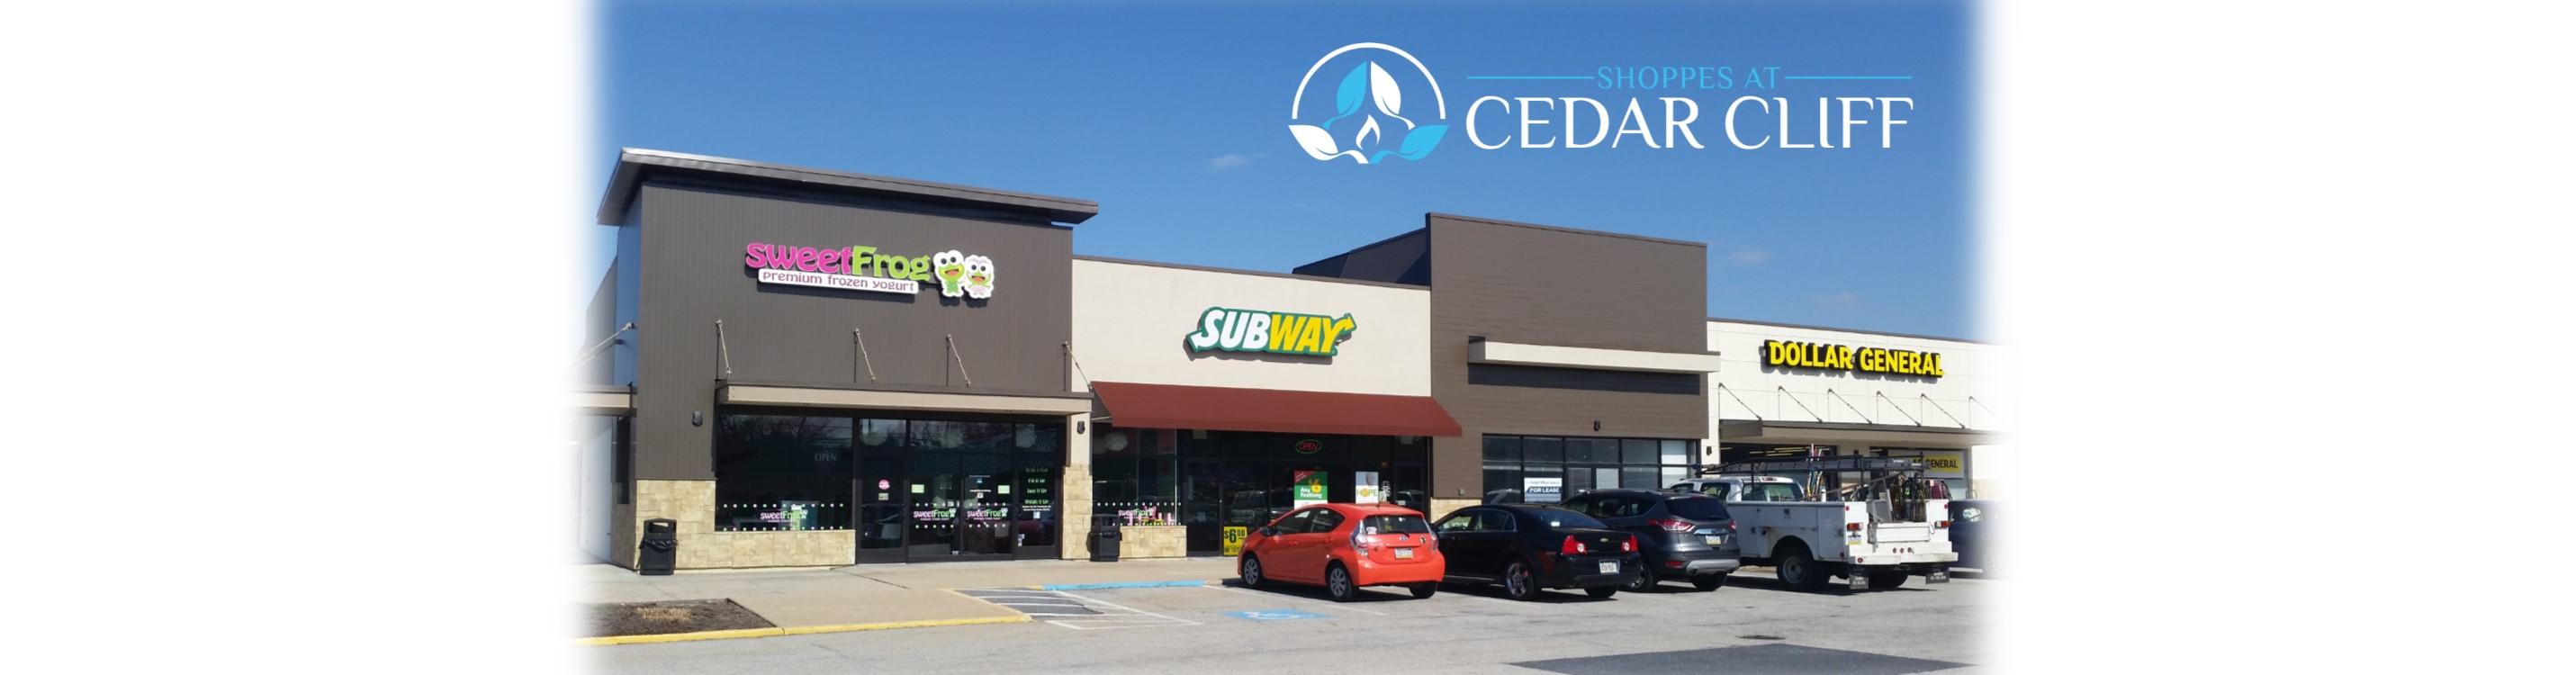 Shoppes at Cedar Cliff